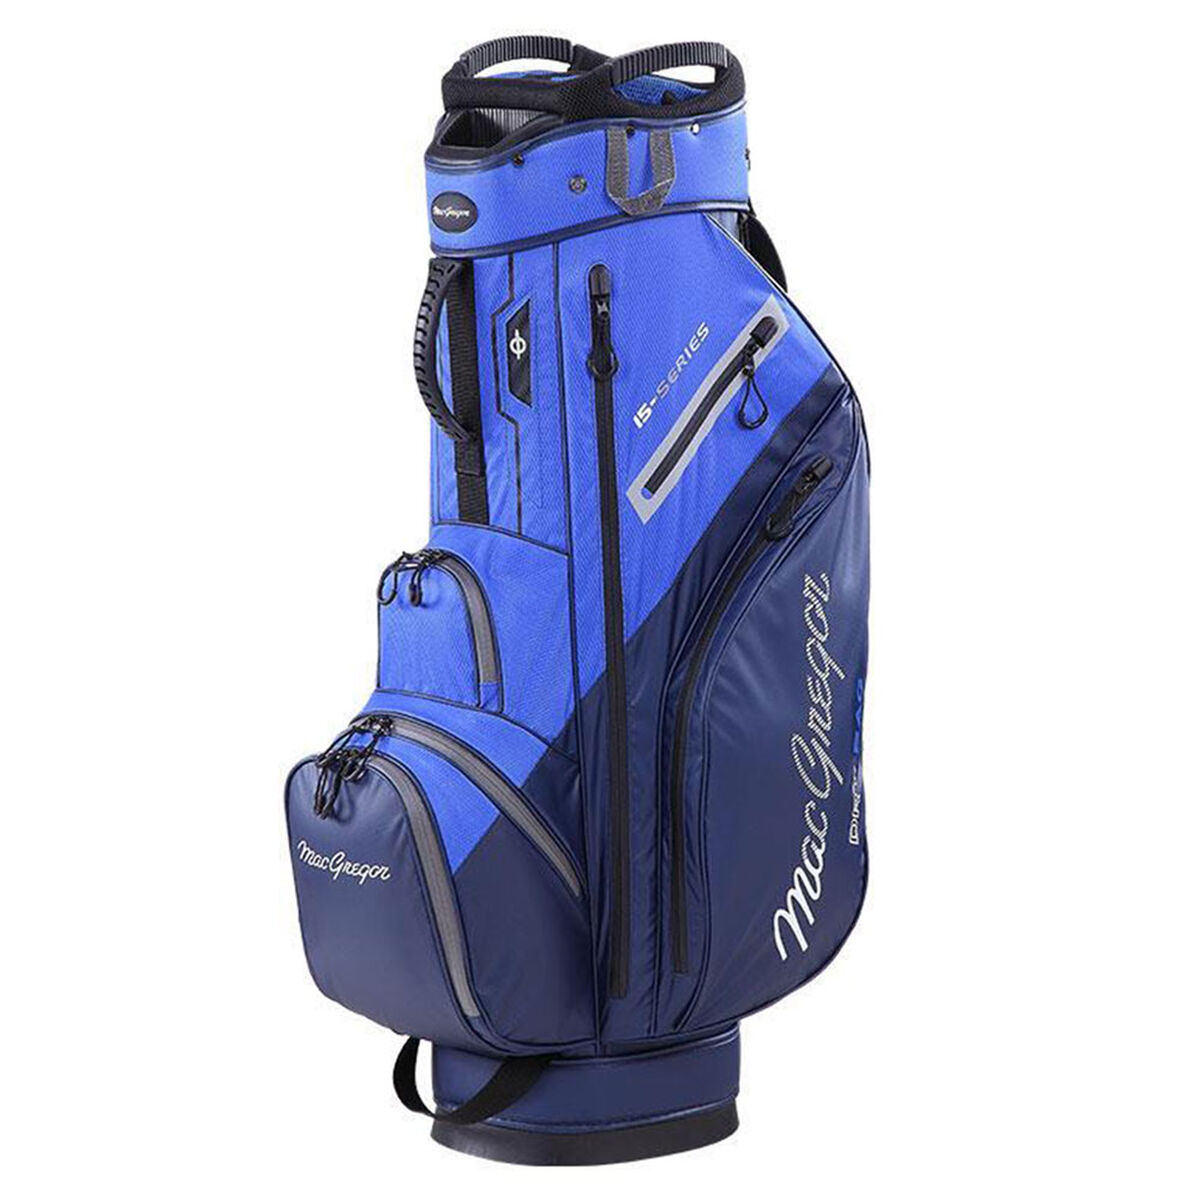 MacGregor 15-Series Water-Resistant Golf Cart Bag, Navy/royal   American Golf